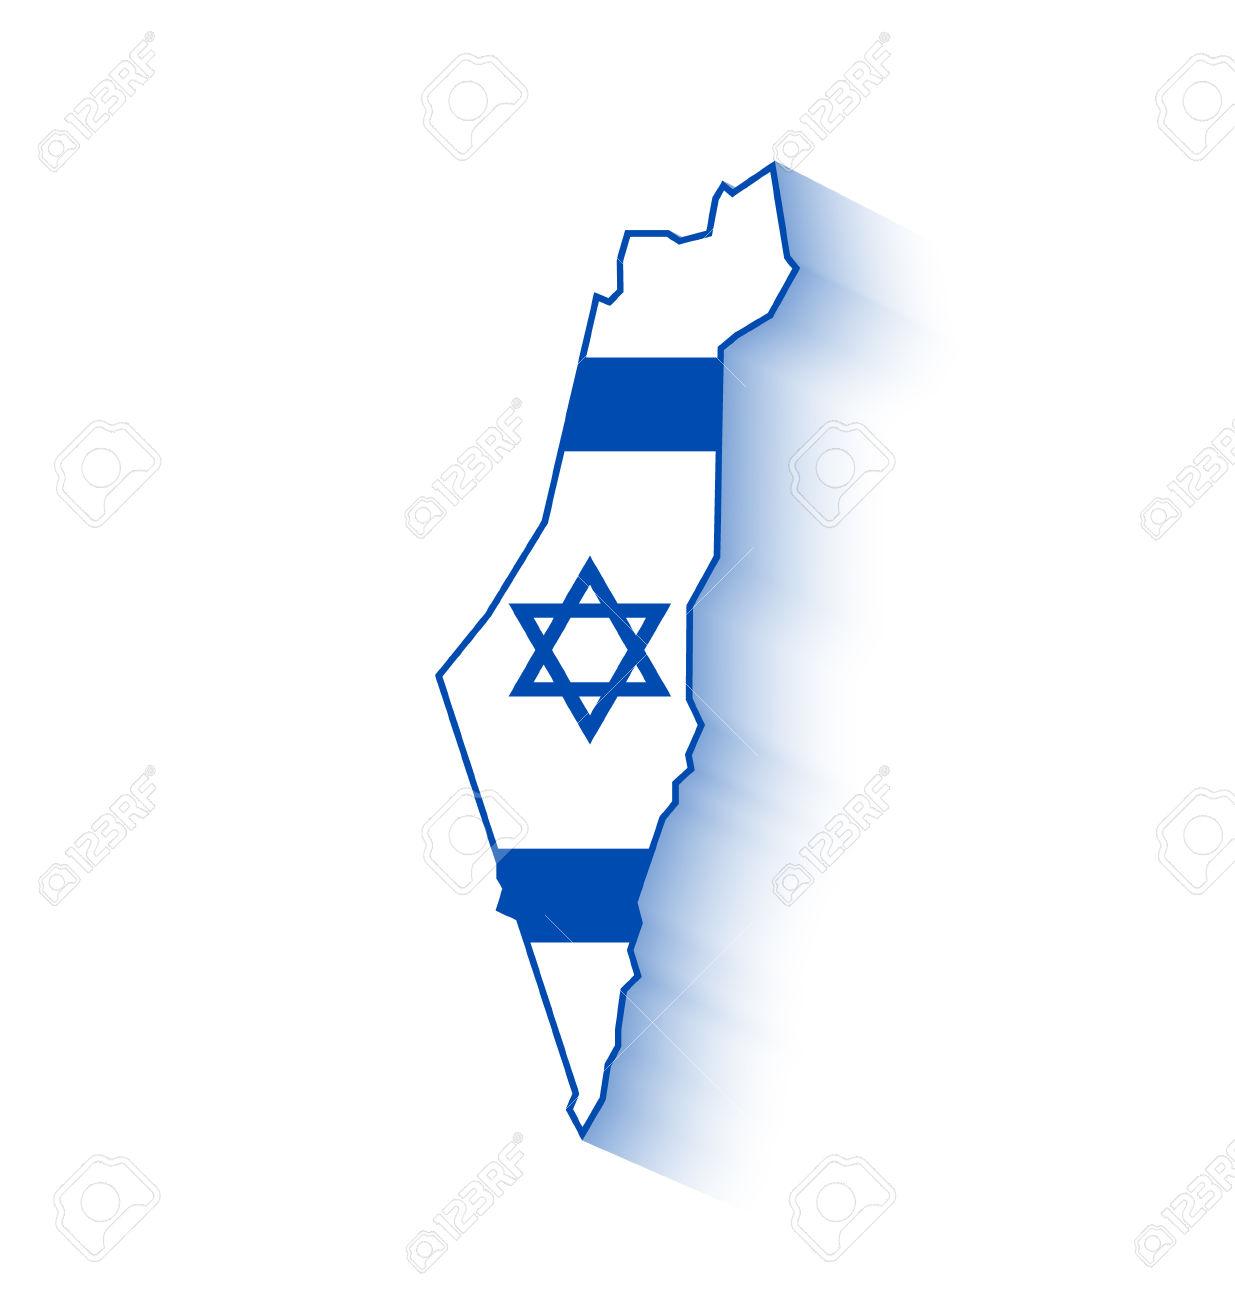 israeli flag israel map with clipart panda free clipart images rh clipartpanda com Greek Flag Clip Art Home Sweet Home Clip Art